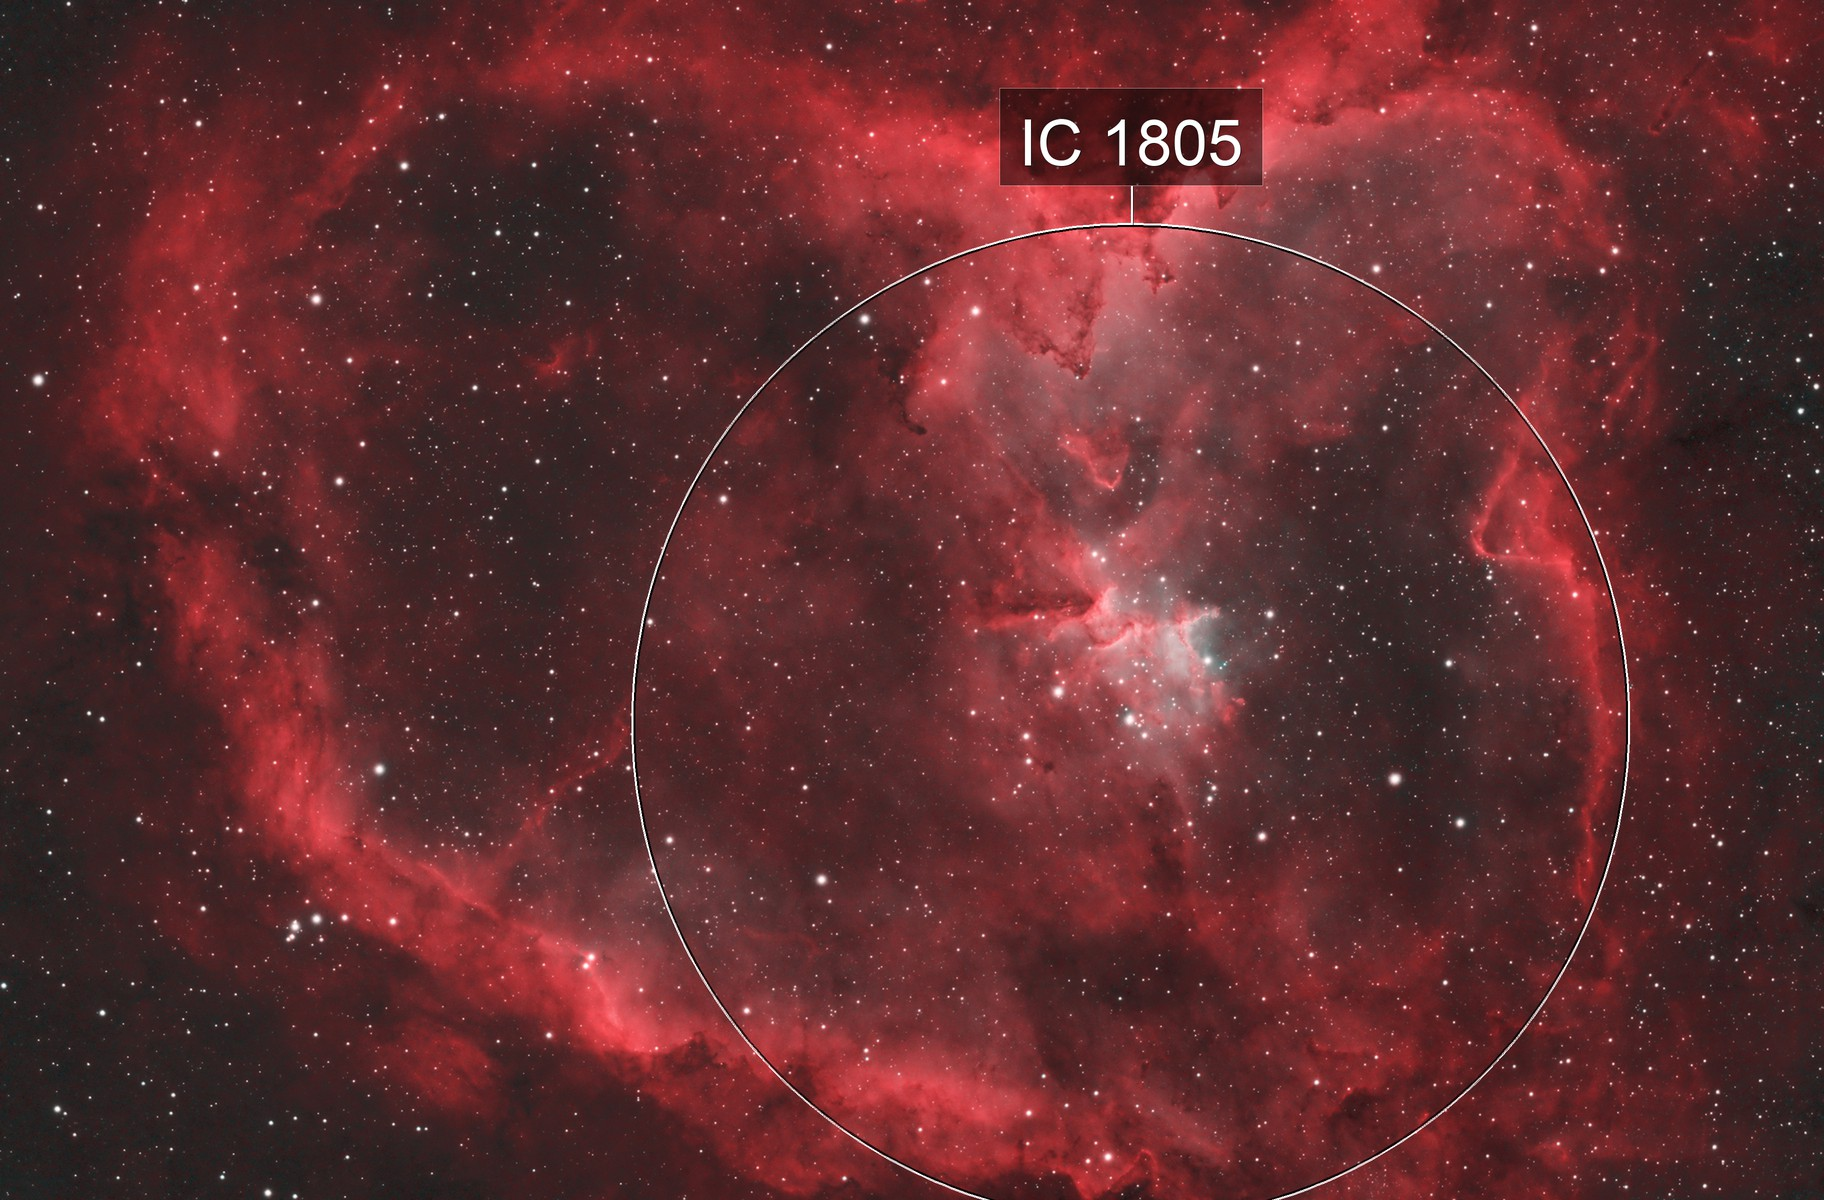 Heart Nebula - HOO